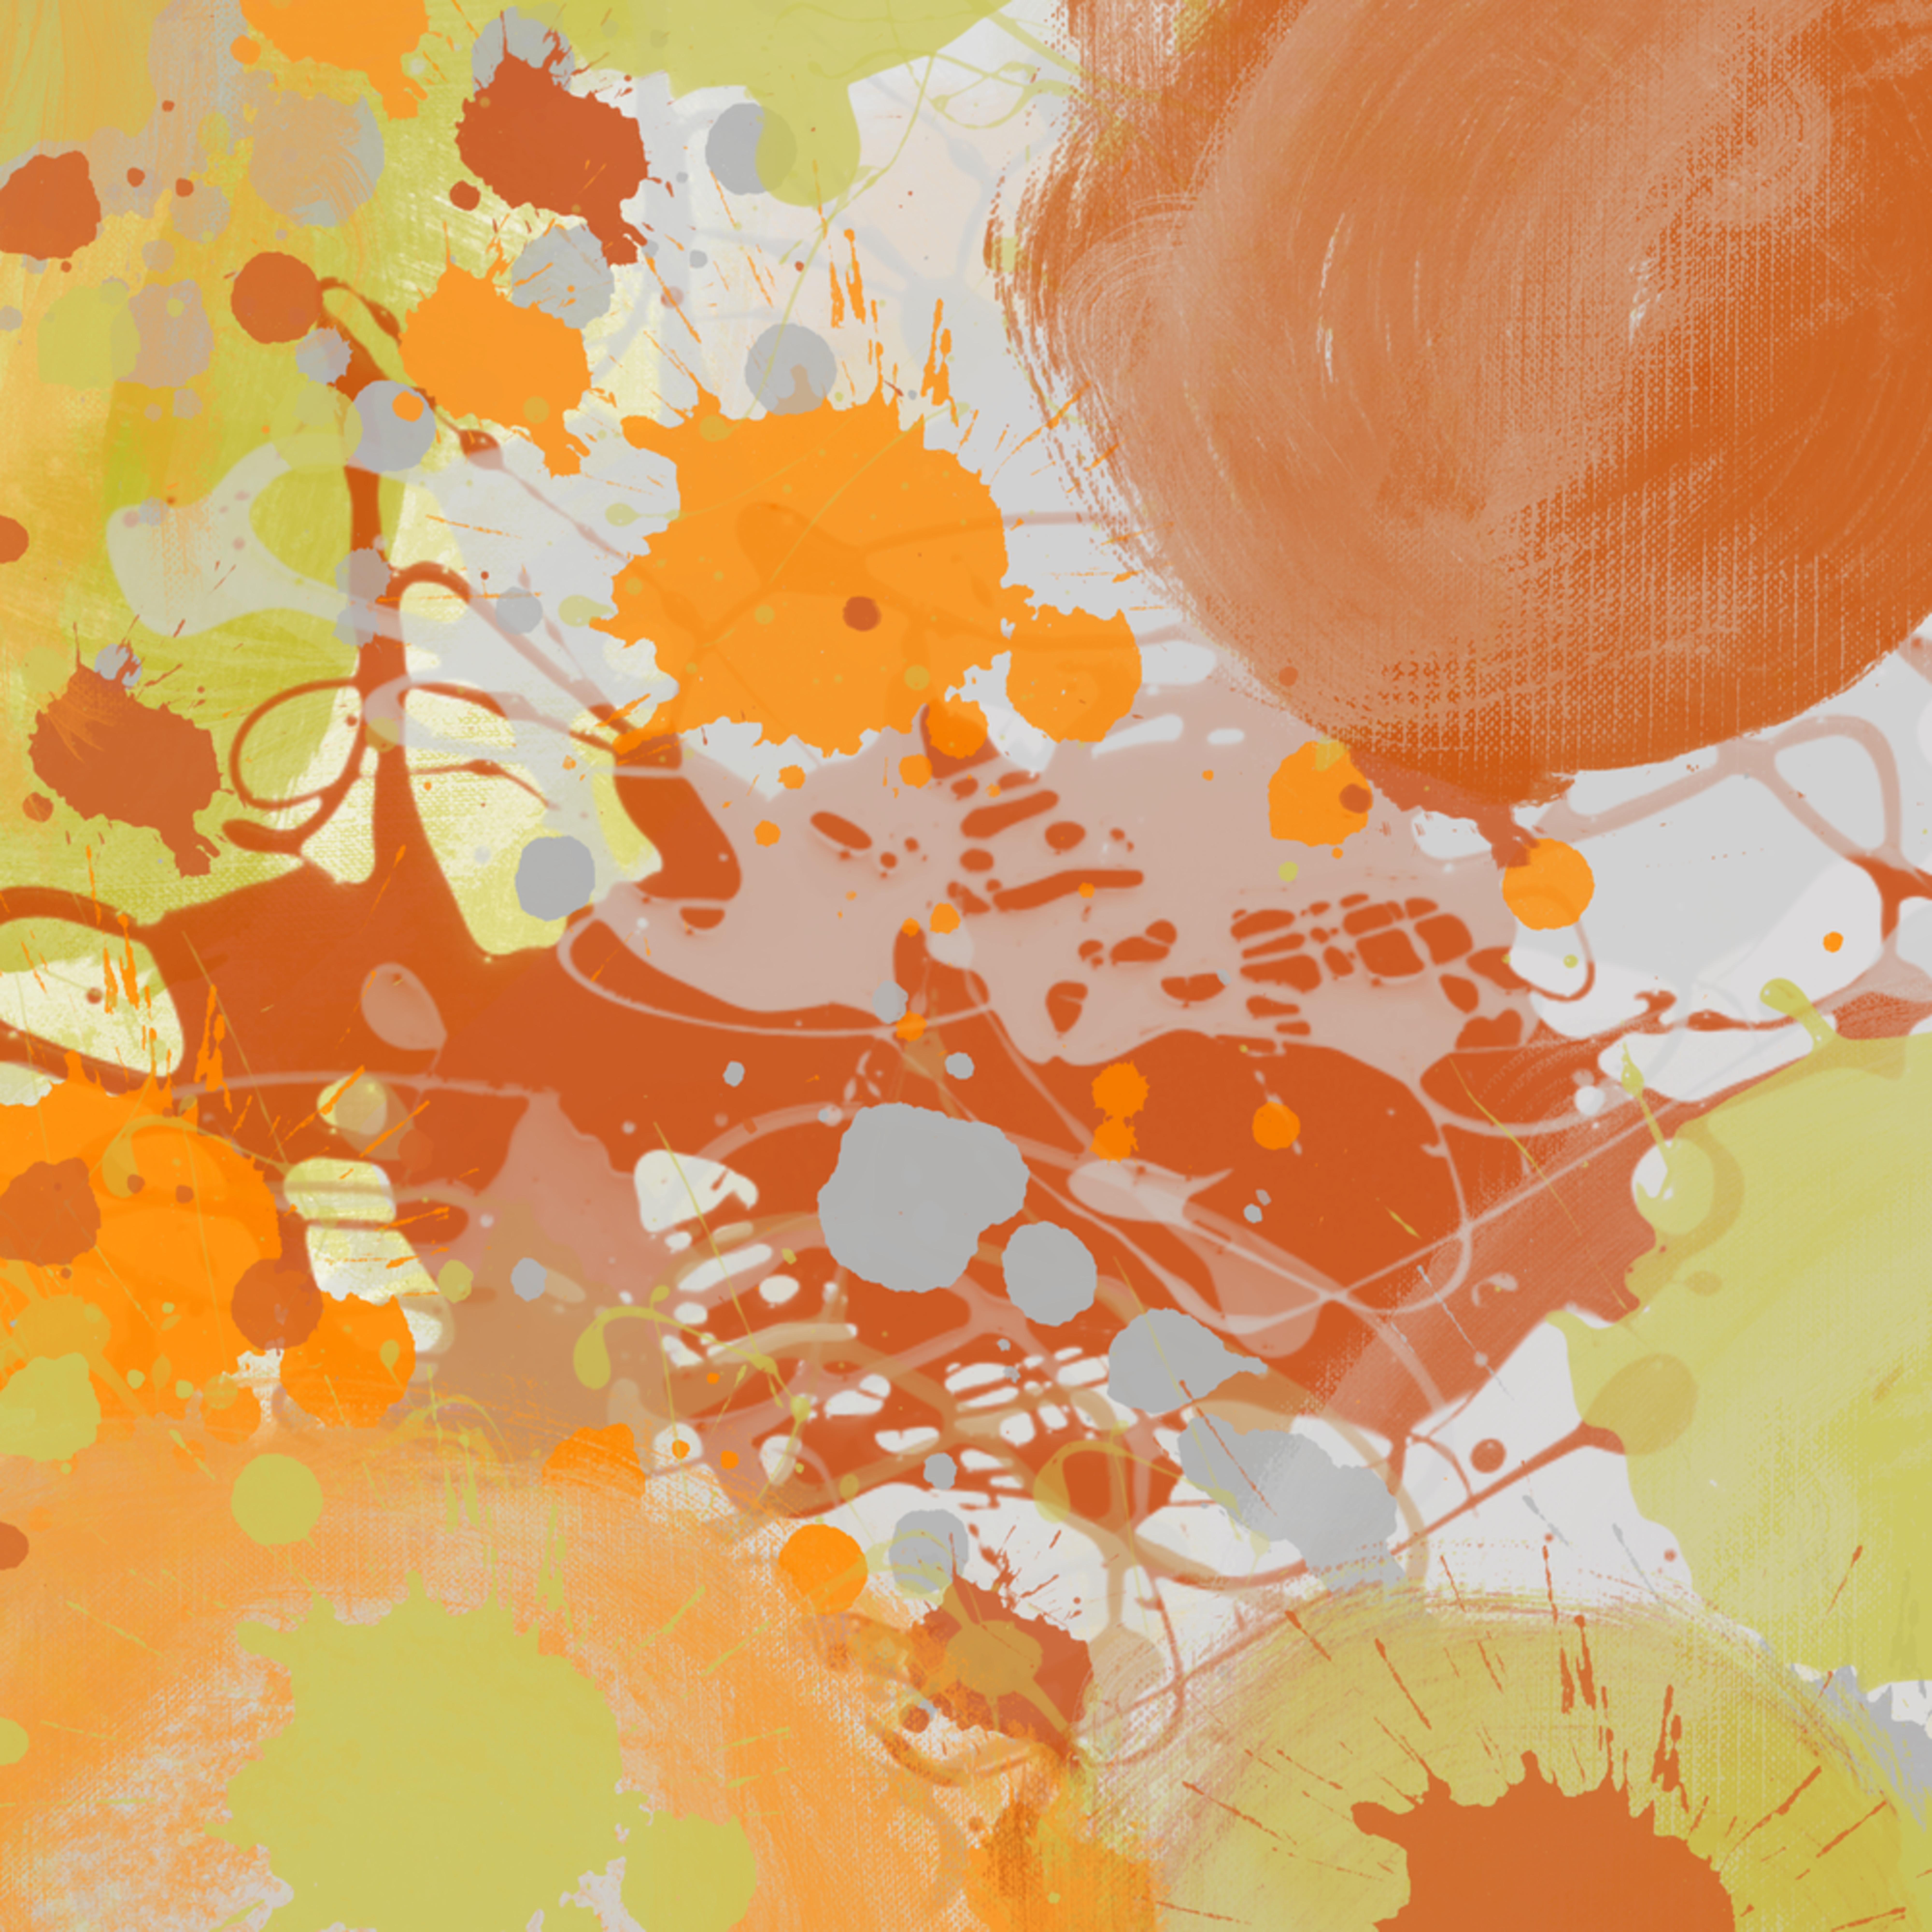 Abstract art 80 8 viaqd6